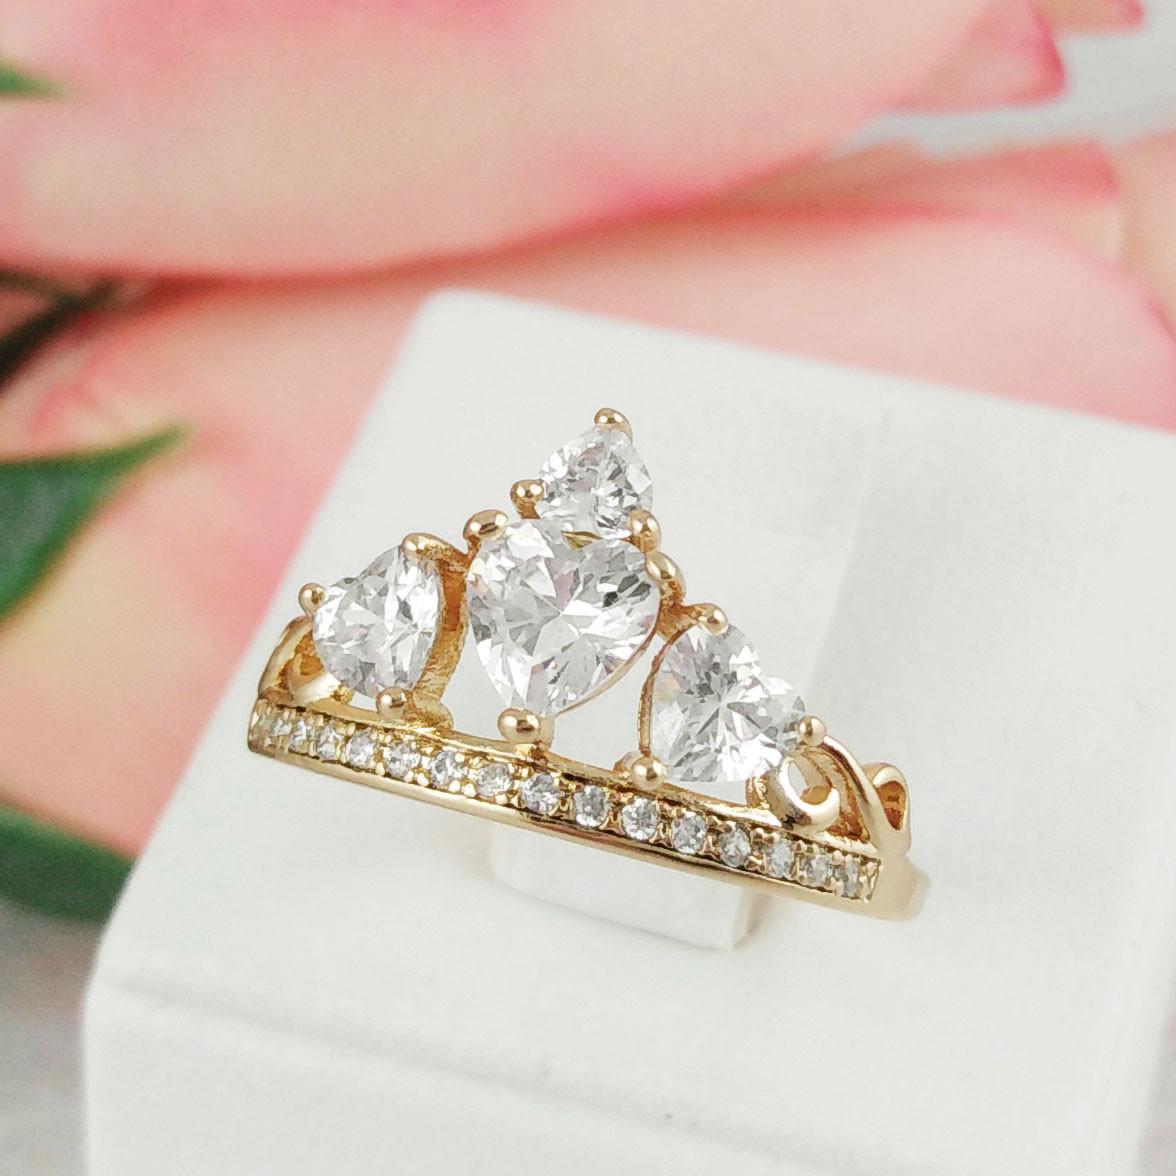 "Кольцо Xuping Jewelry размер 19,5 ""Корона"" медицинское золото, позолота 18К. А/В 3140"